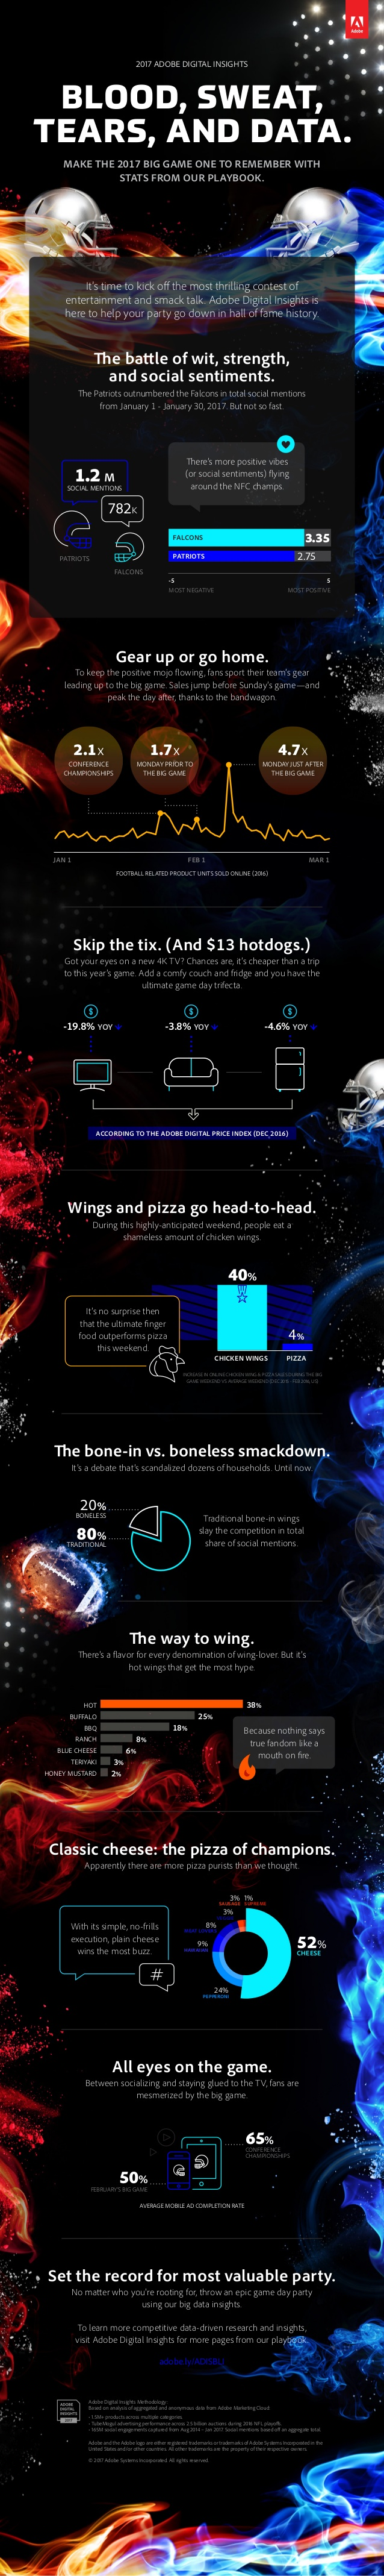 adobe-digital-insights-big-game-2017-analysis-infographic-1-638